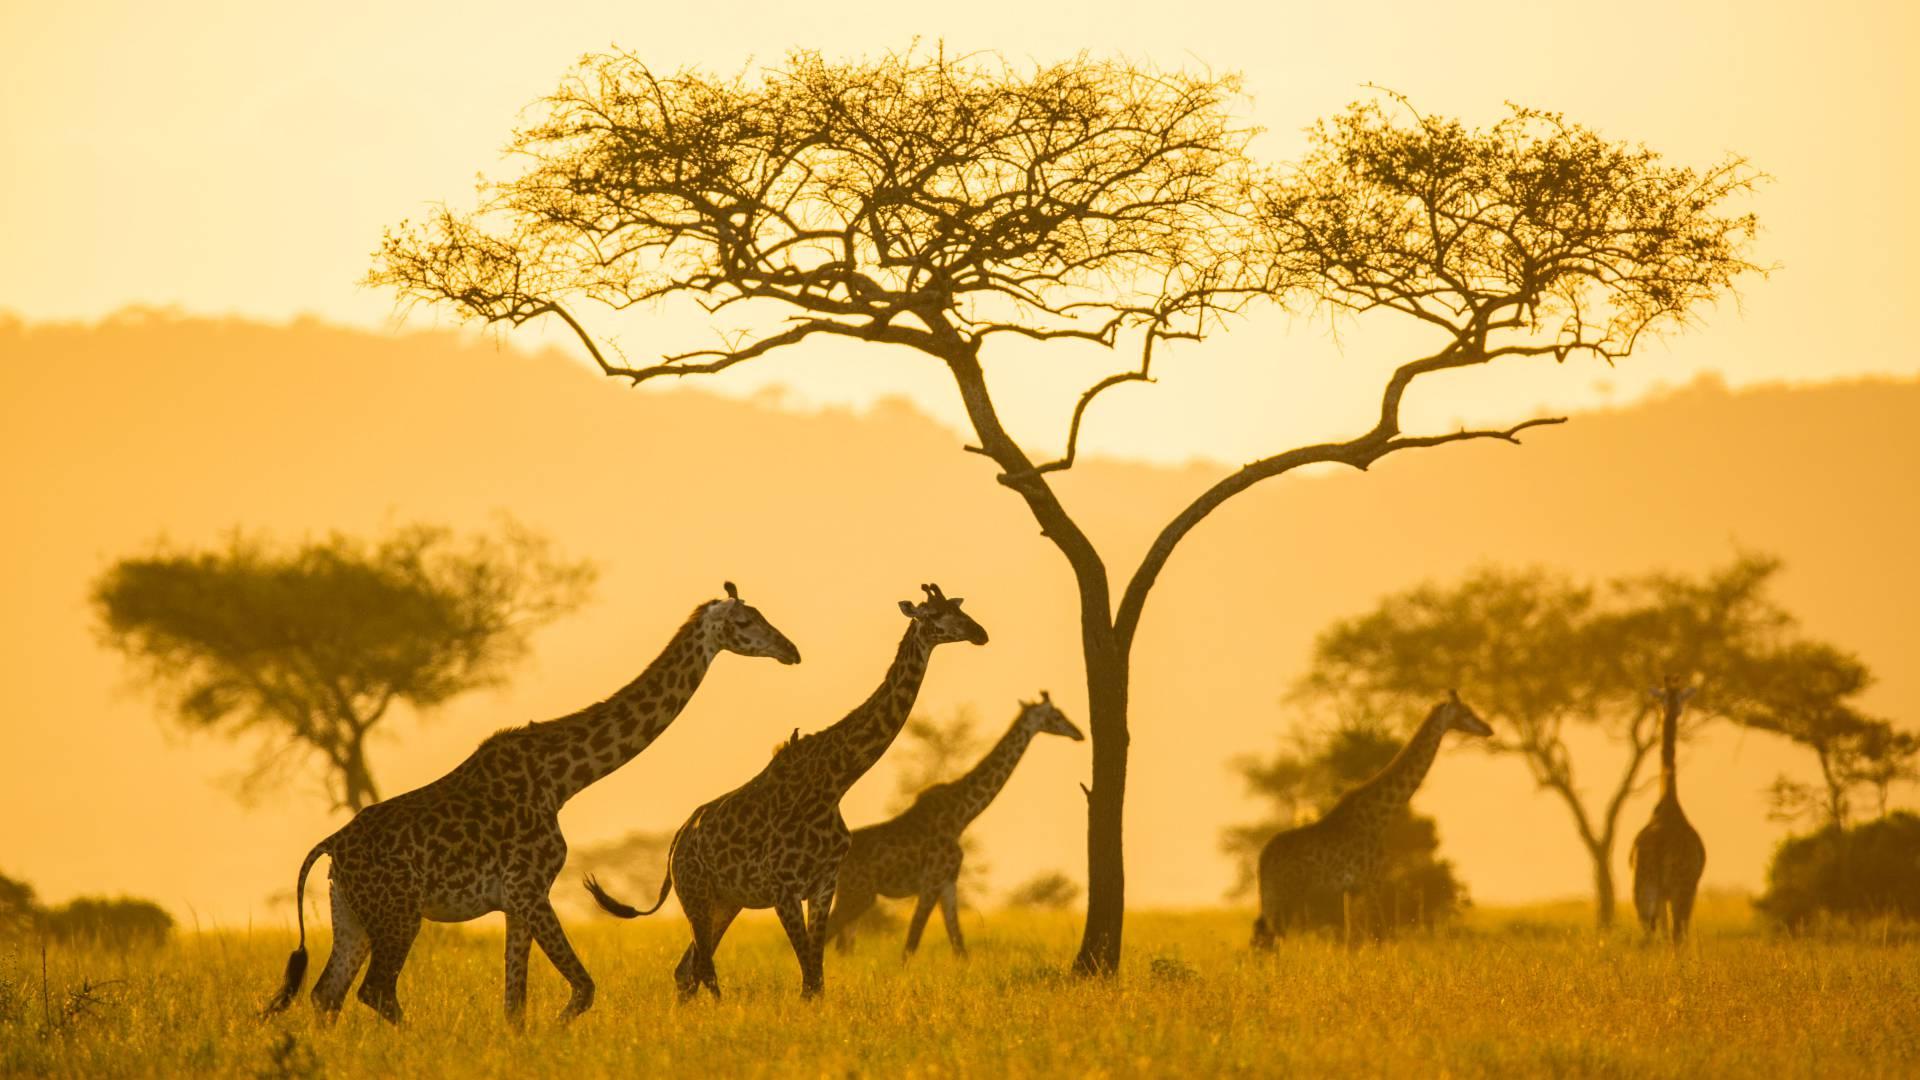 Giraffen seregeti pioneer camp